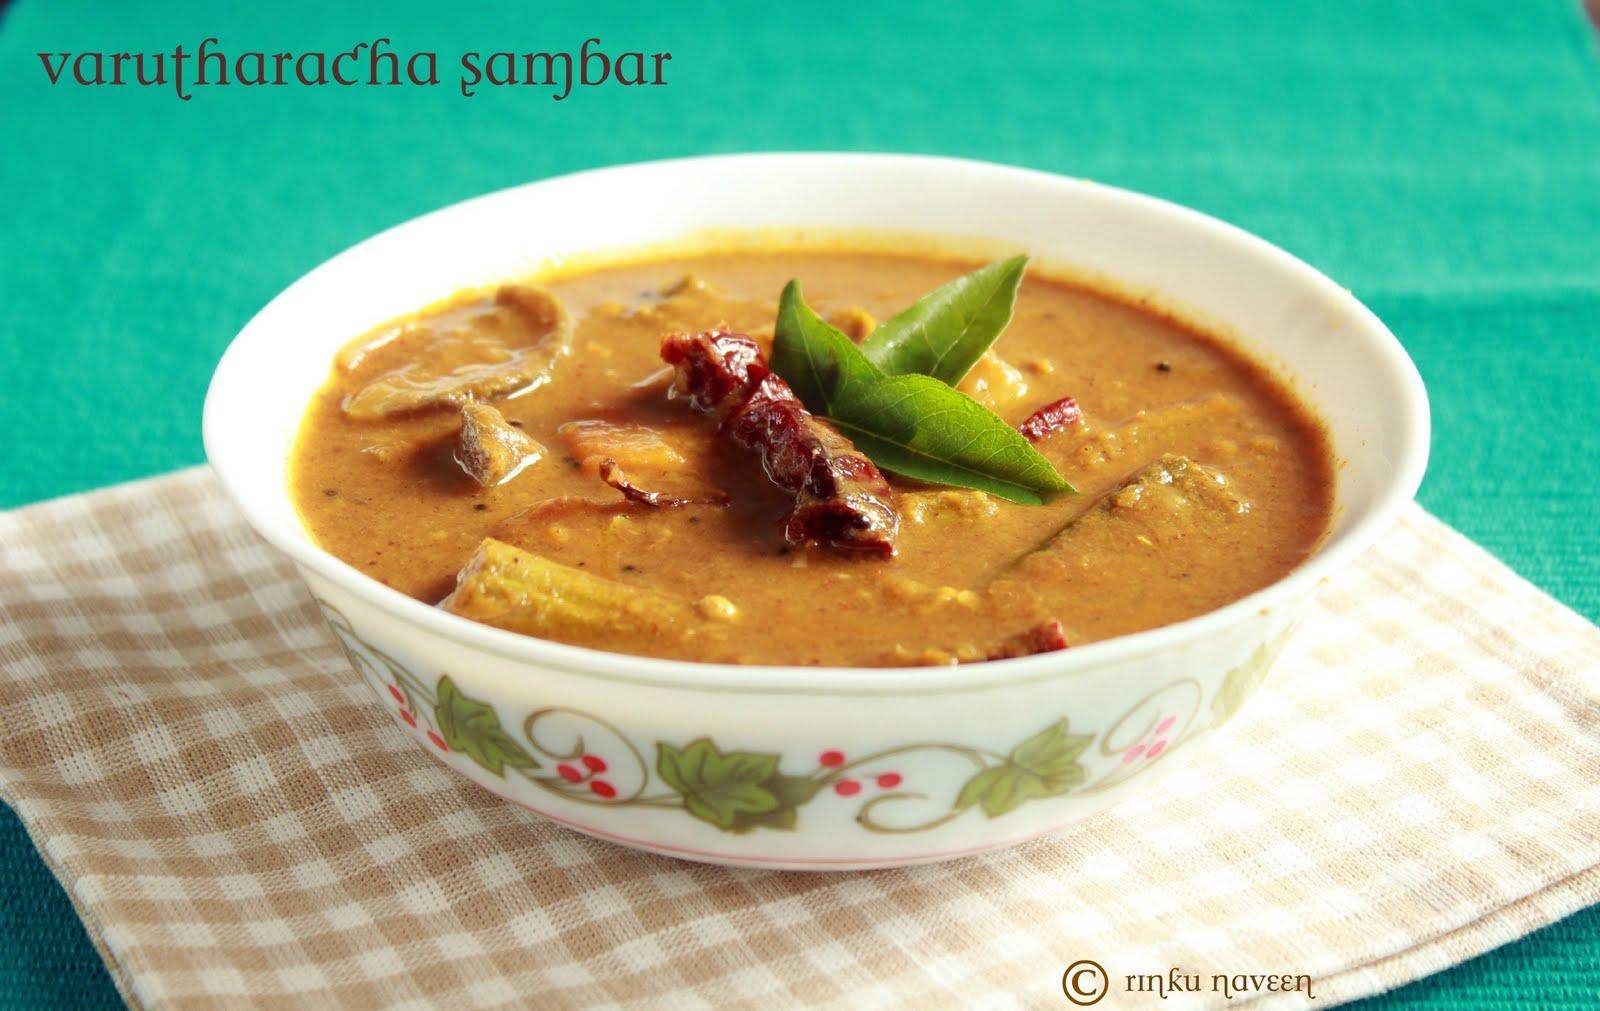 Rinkus Kitchen TreatsVarutharacha Sambar / Sambar with Roasted